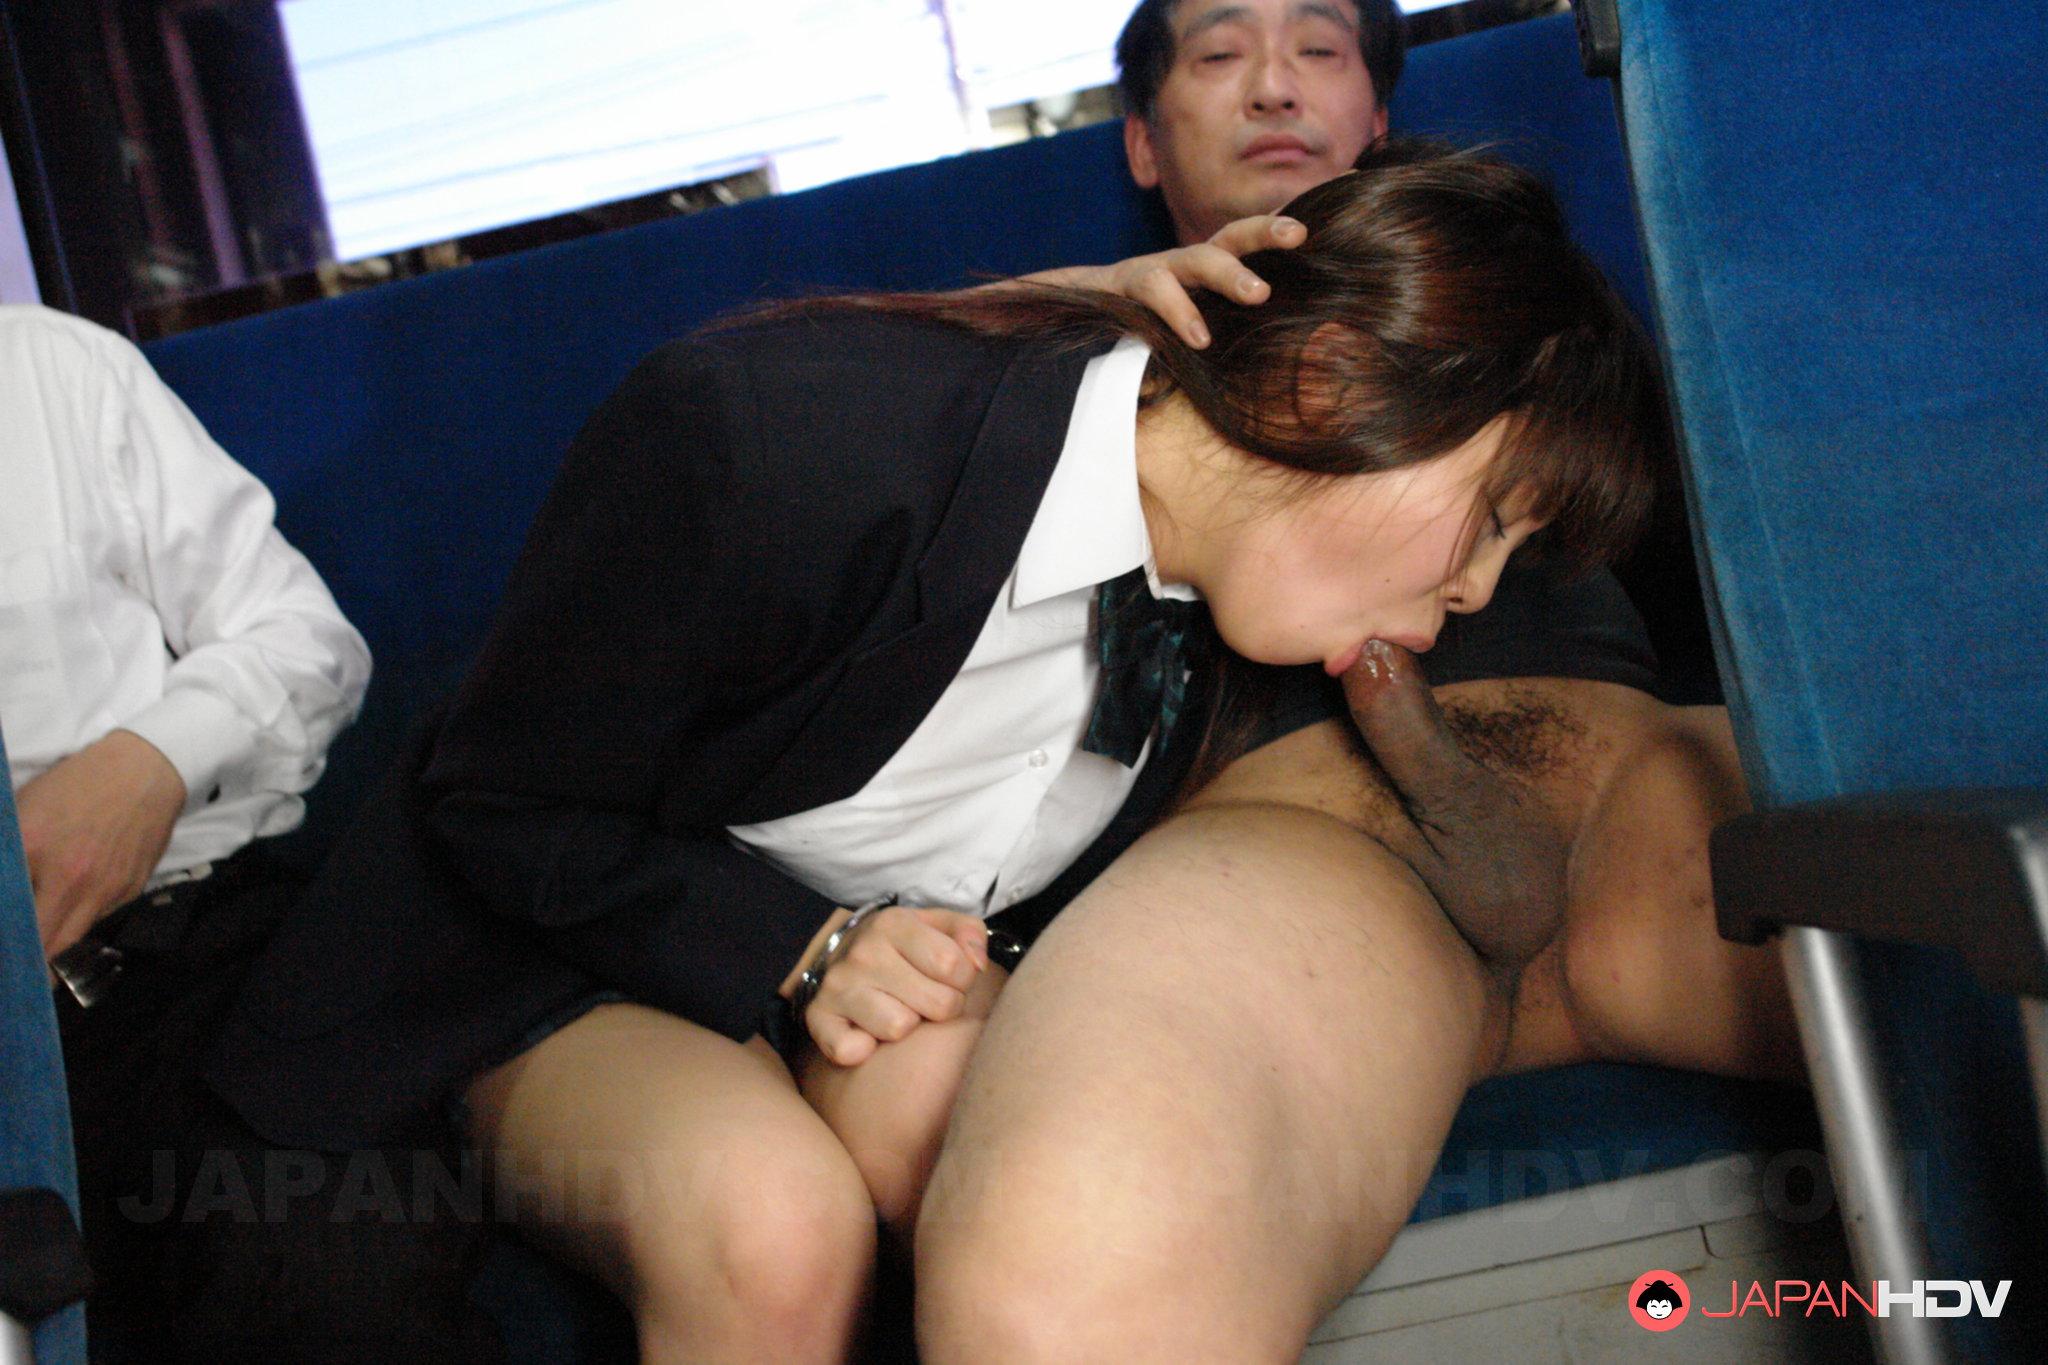 Ххх Видео Японки В Автобусе